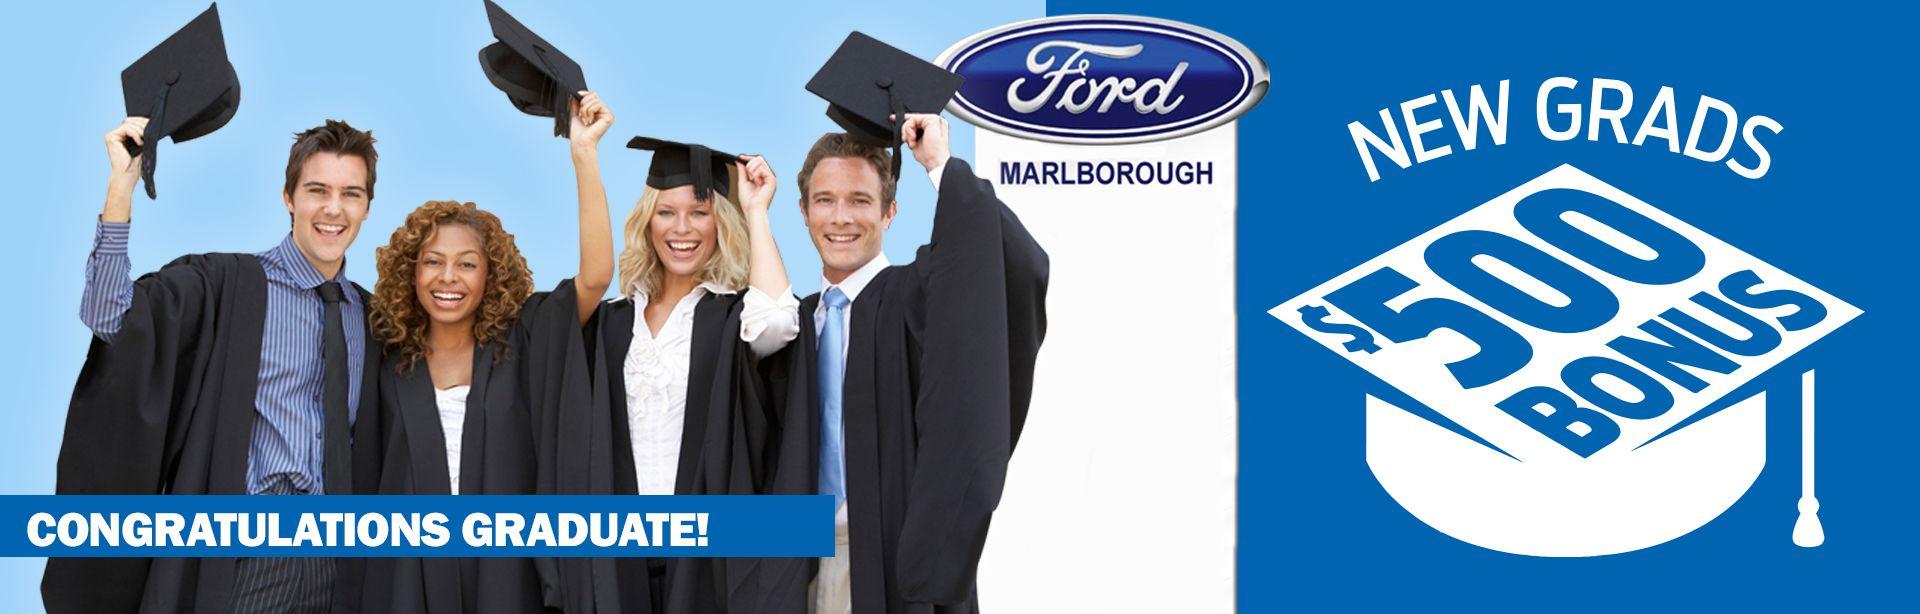 New_Graduate_Program_at_Marlborough_Ford